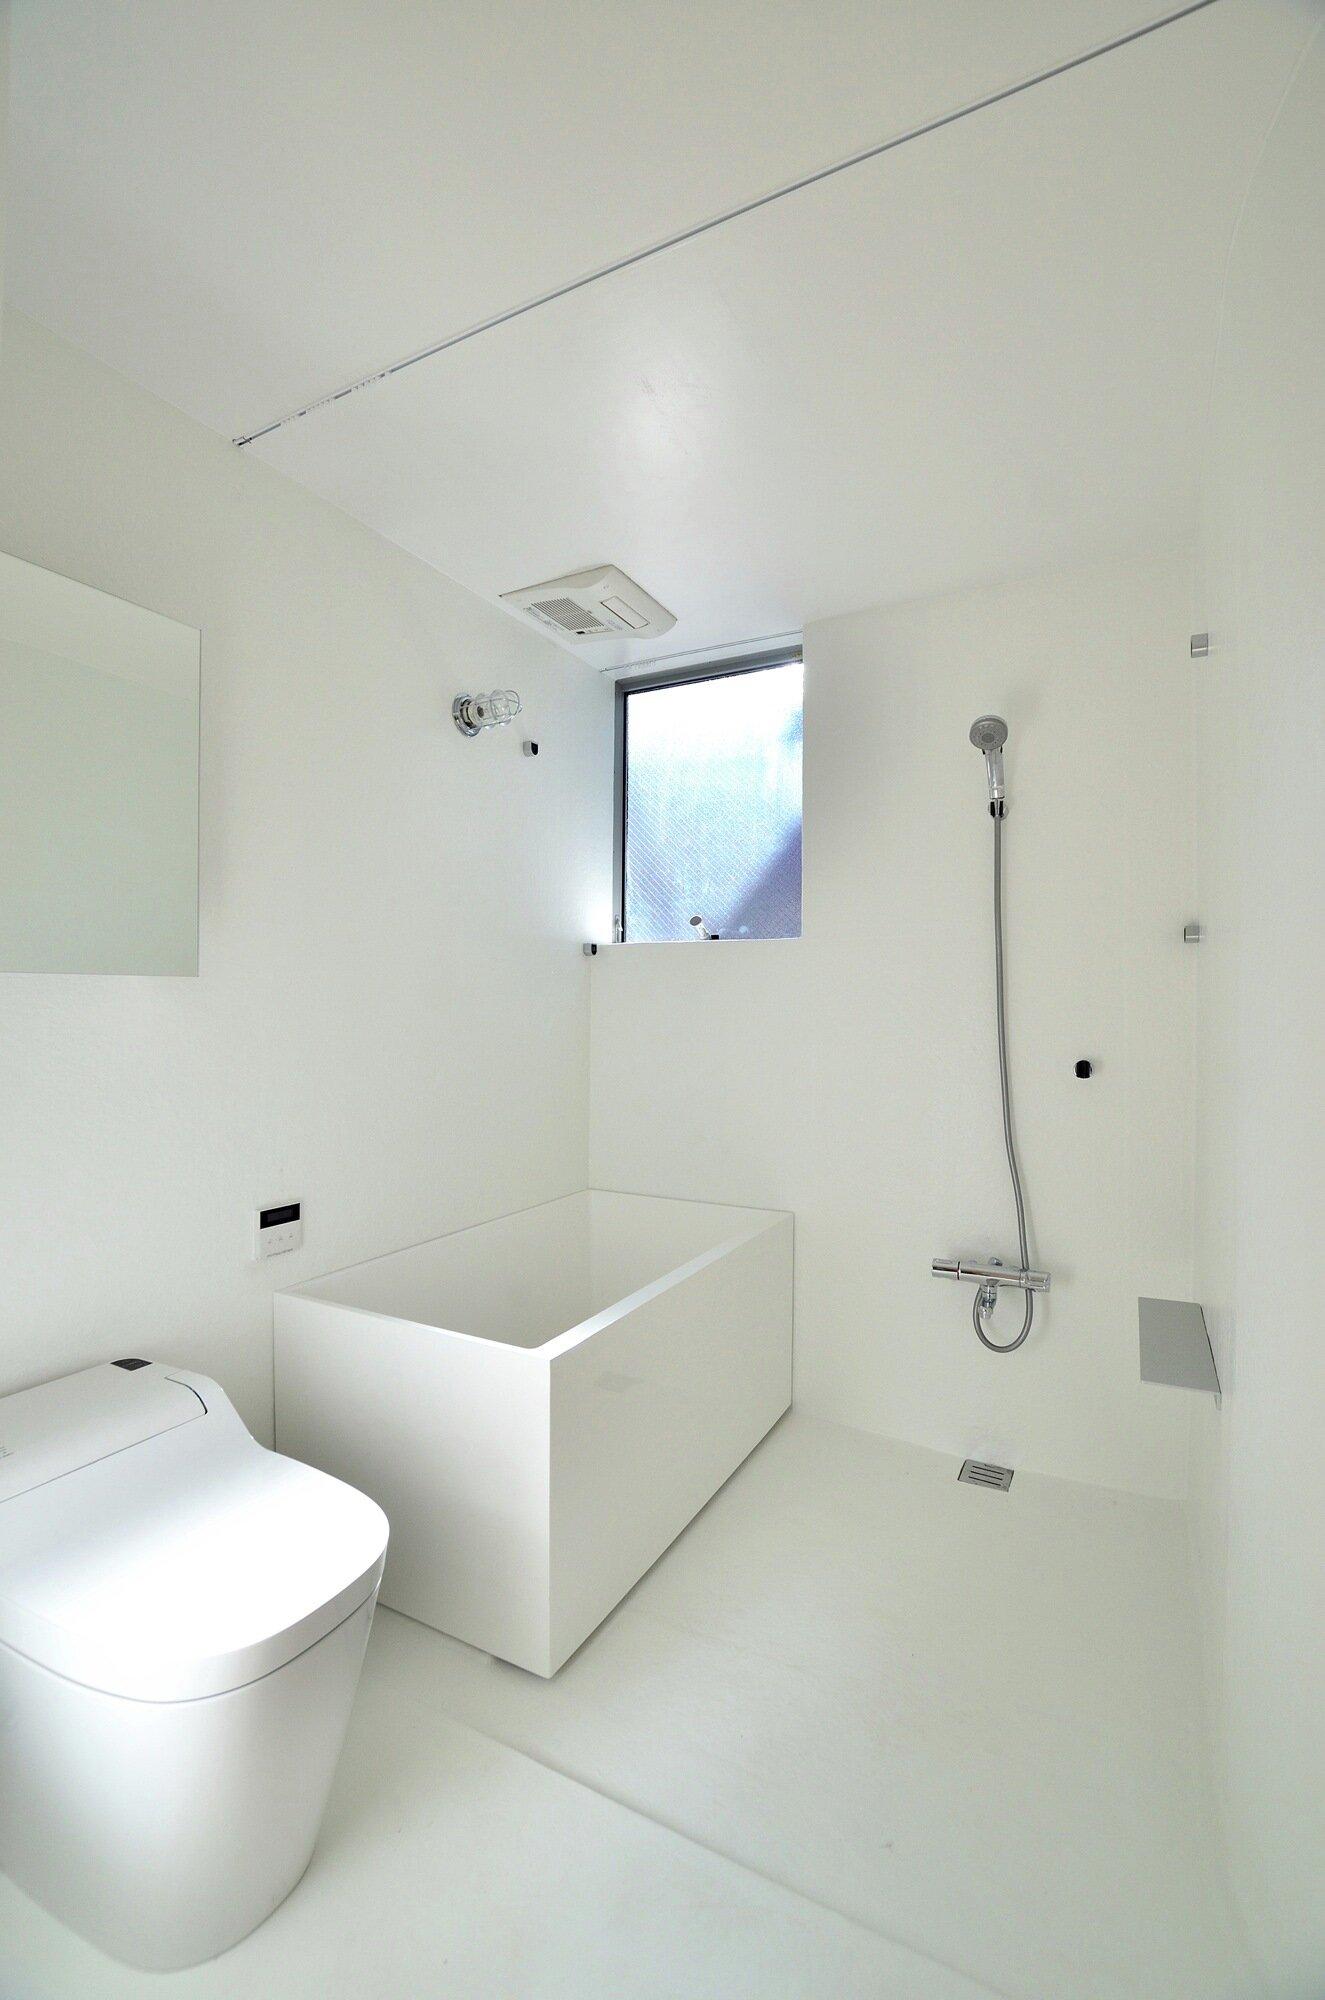 Townhouse in Takaban - Niji Architects - Tokyo - Bathroom - Humble Homes